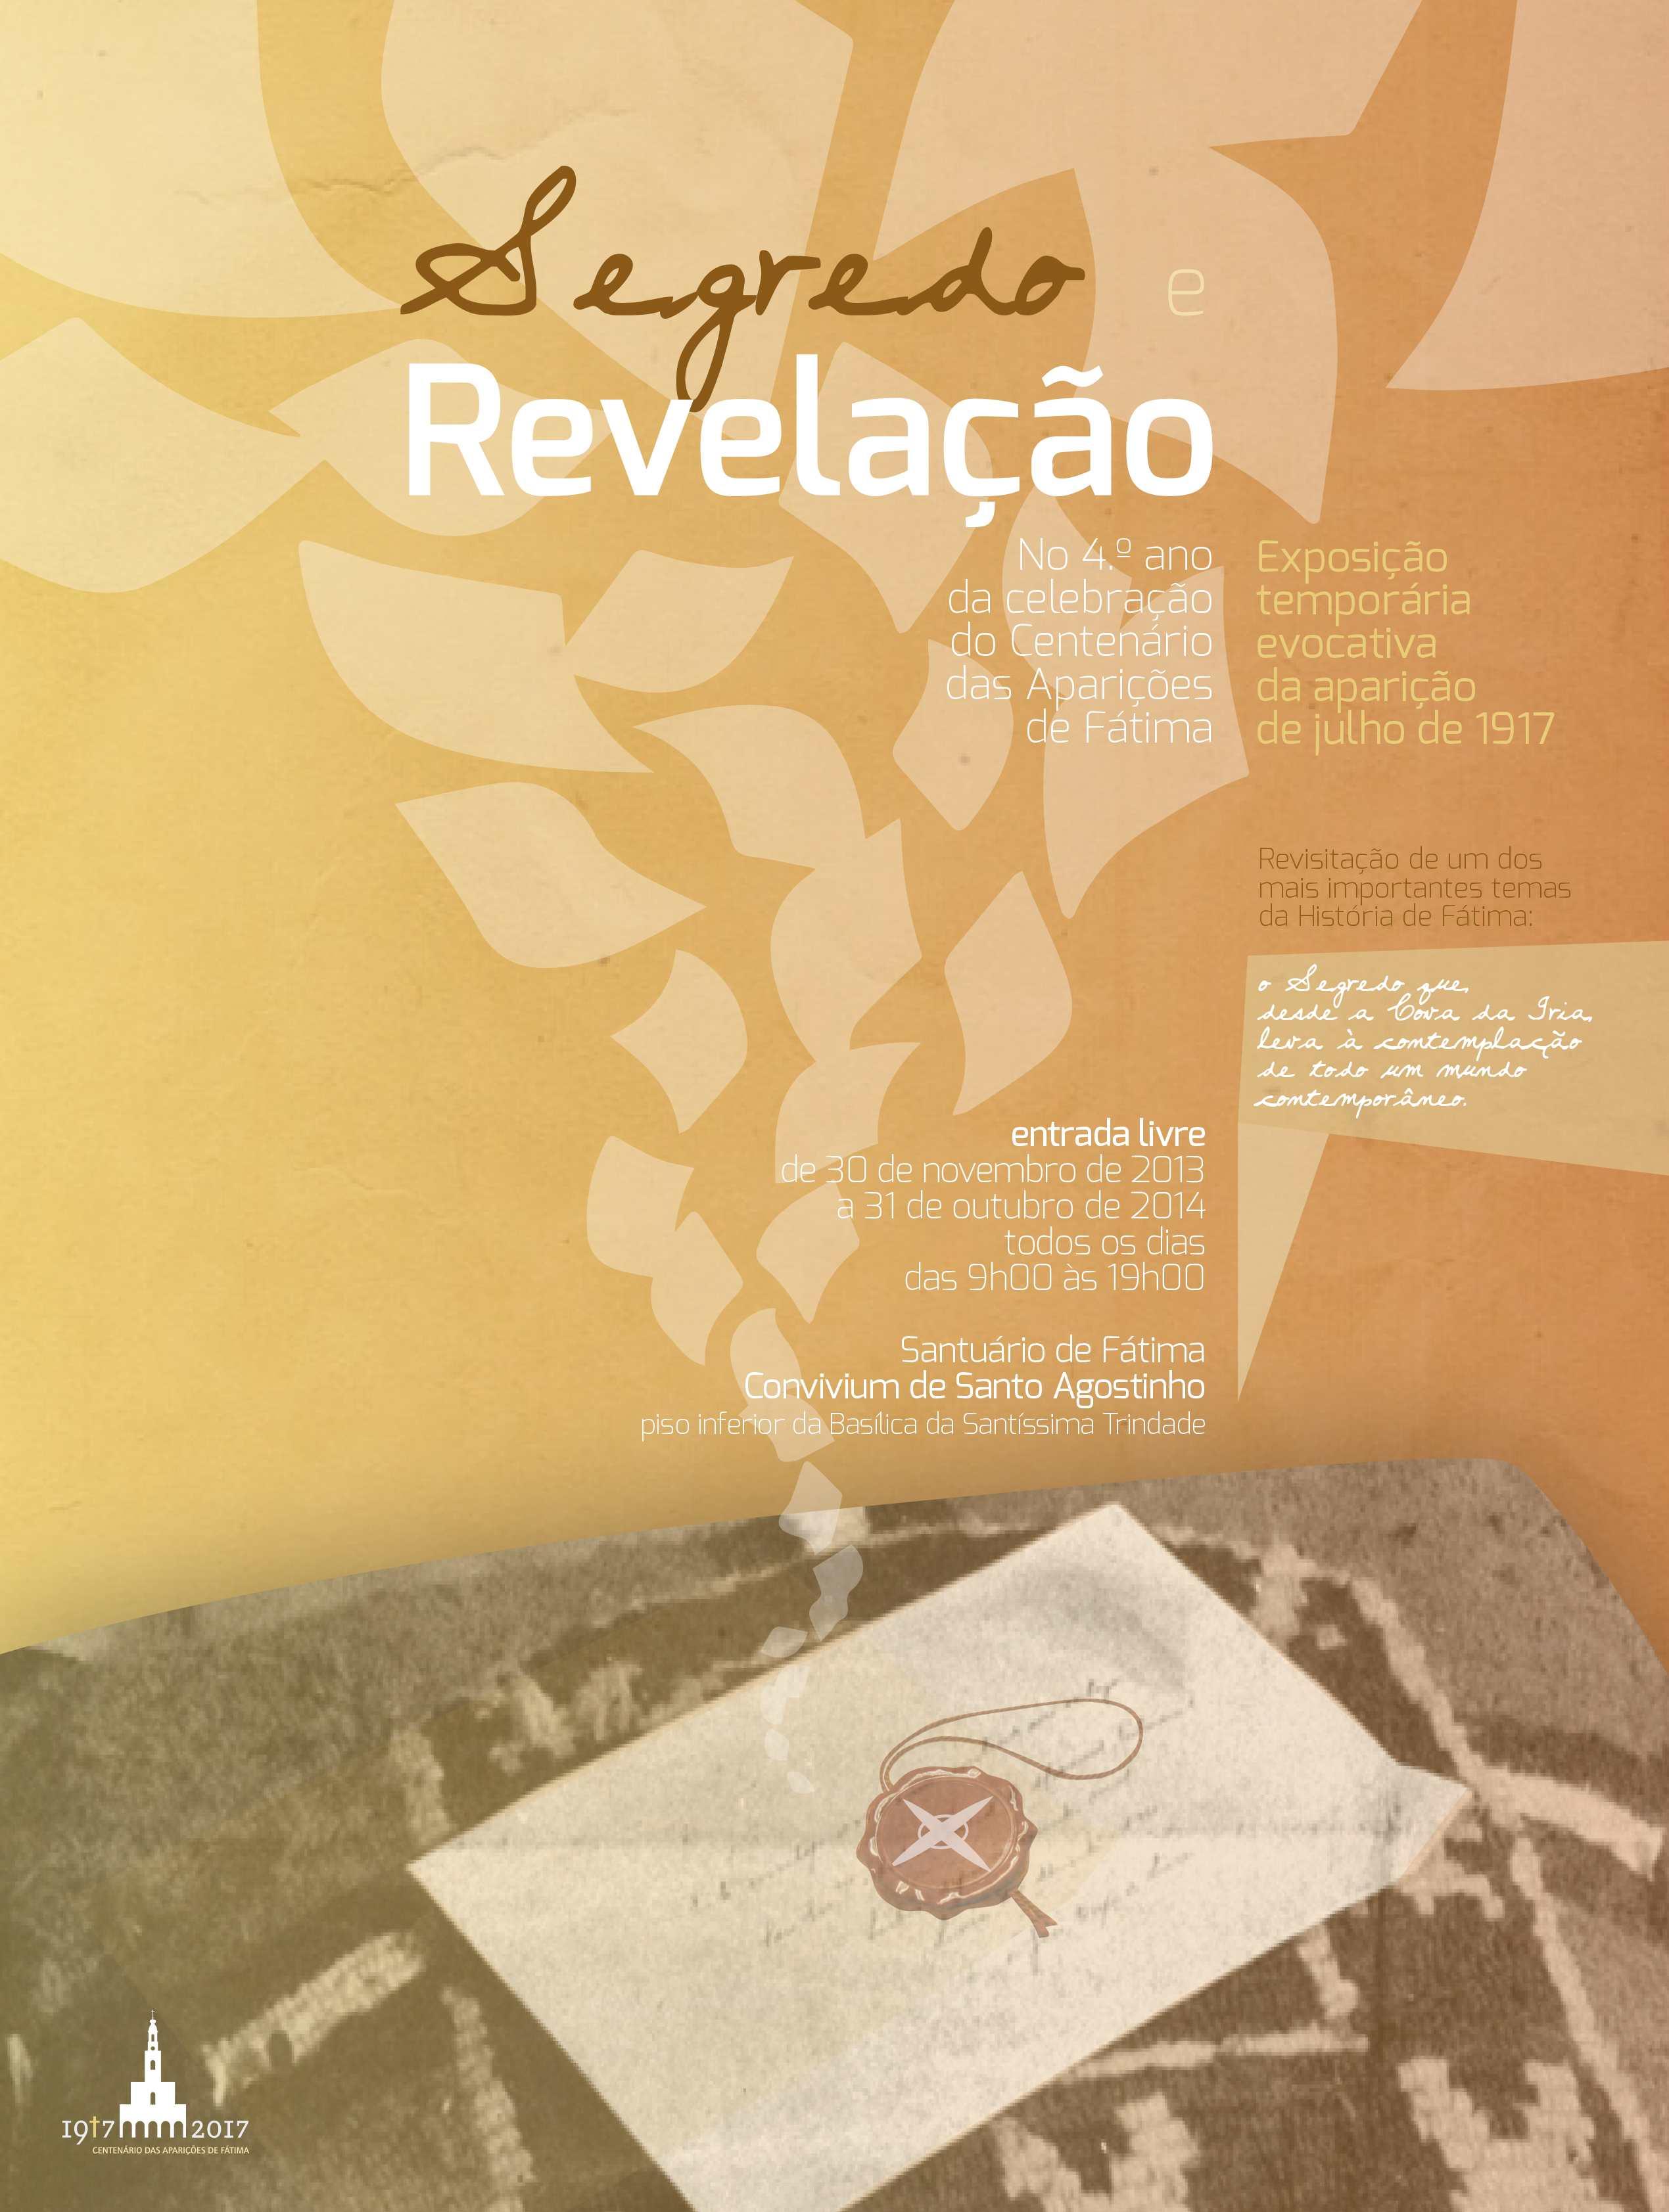 Exposicao 2013-14.jpg